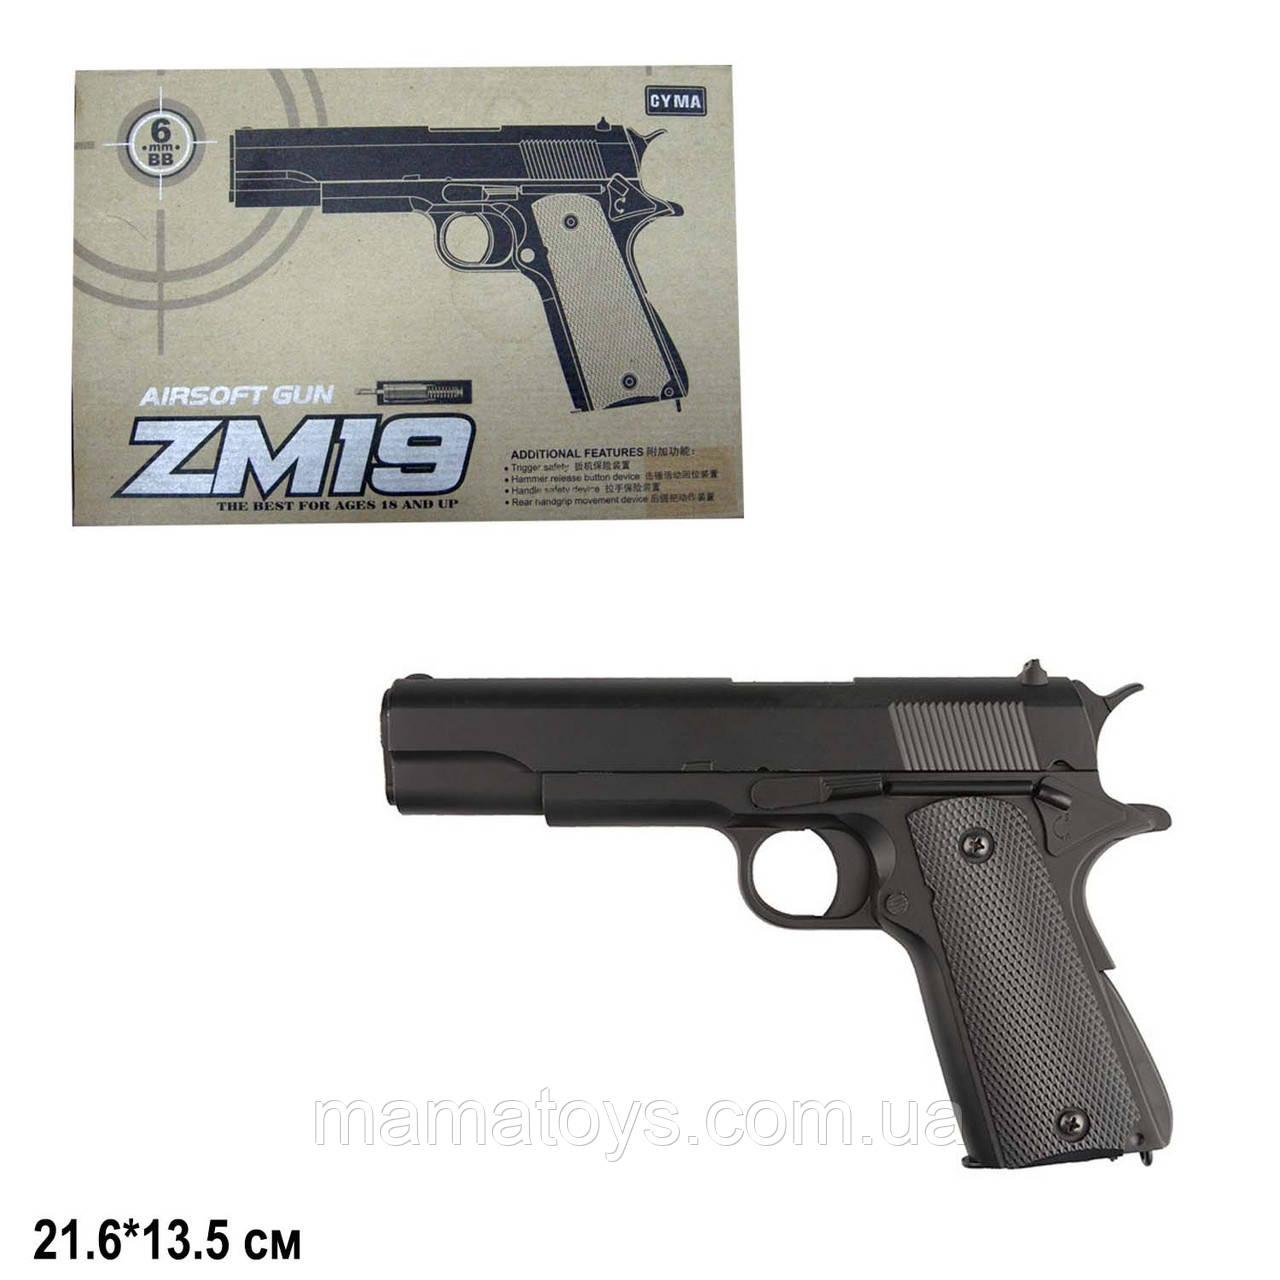 Игрушечный Пистолет CYMA ZM19 Металл - пластик  с пульками 6 мм